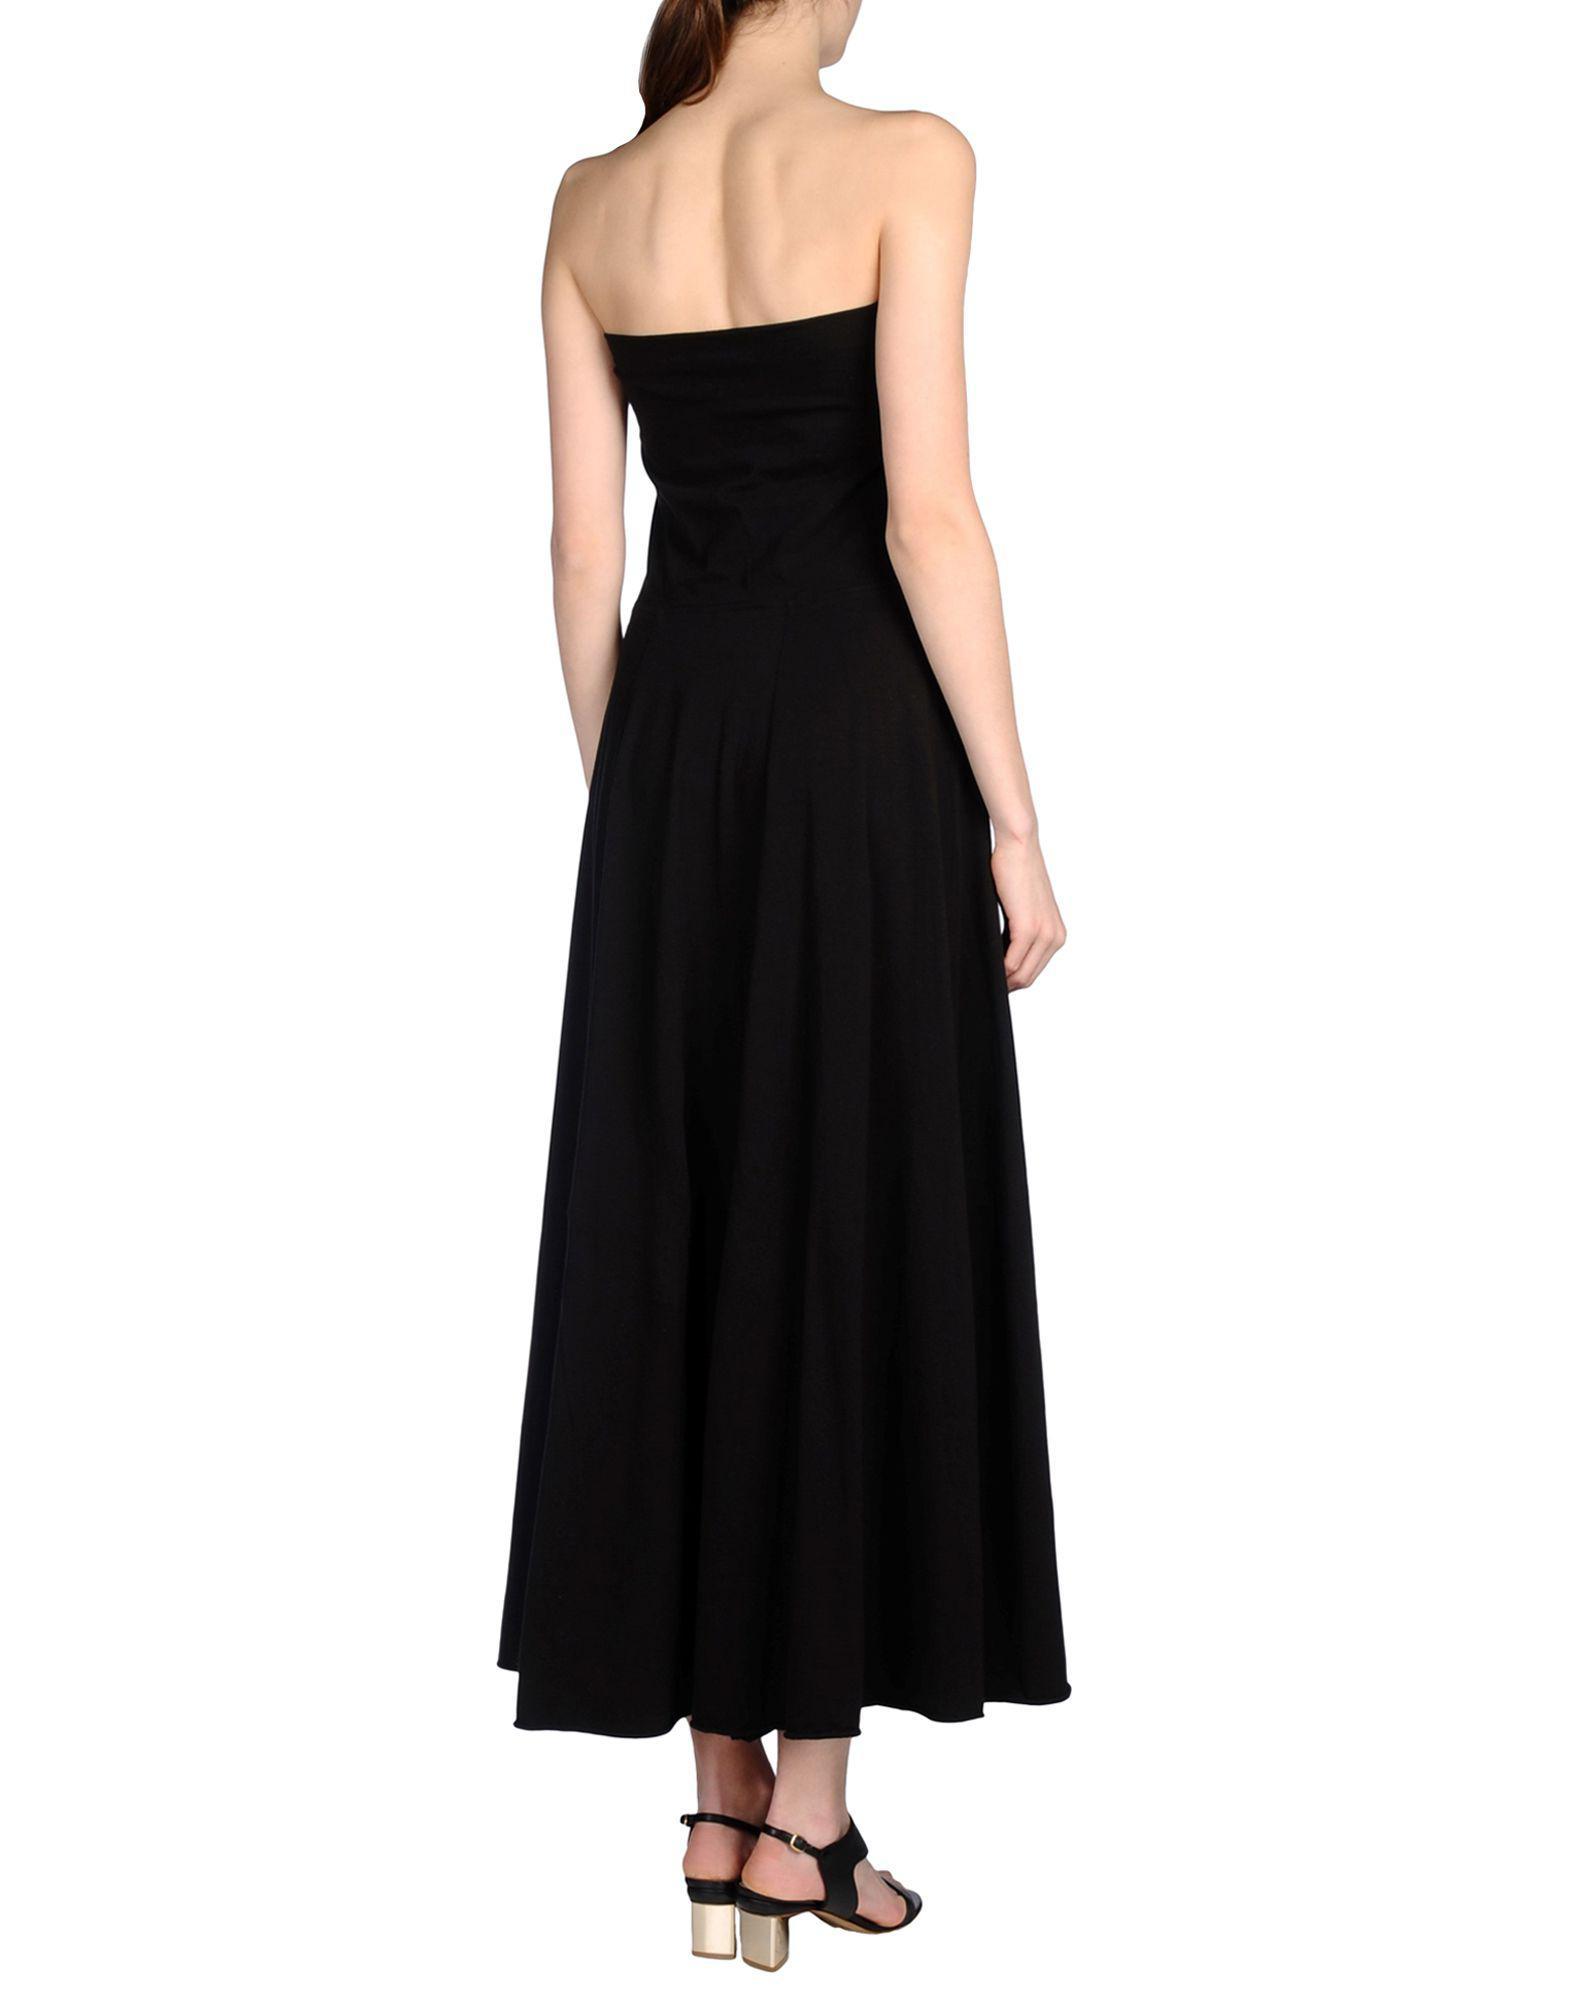 Satine Label Cotton Long Dress in Dark Brown (Brown)